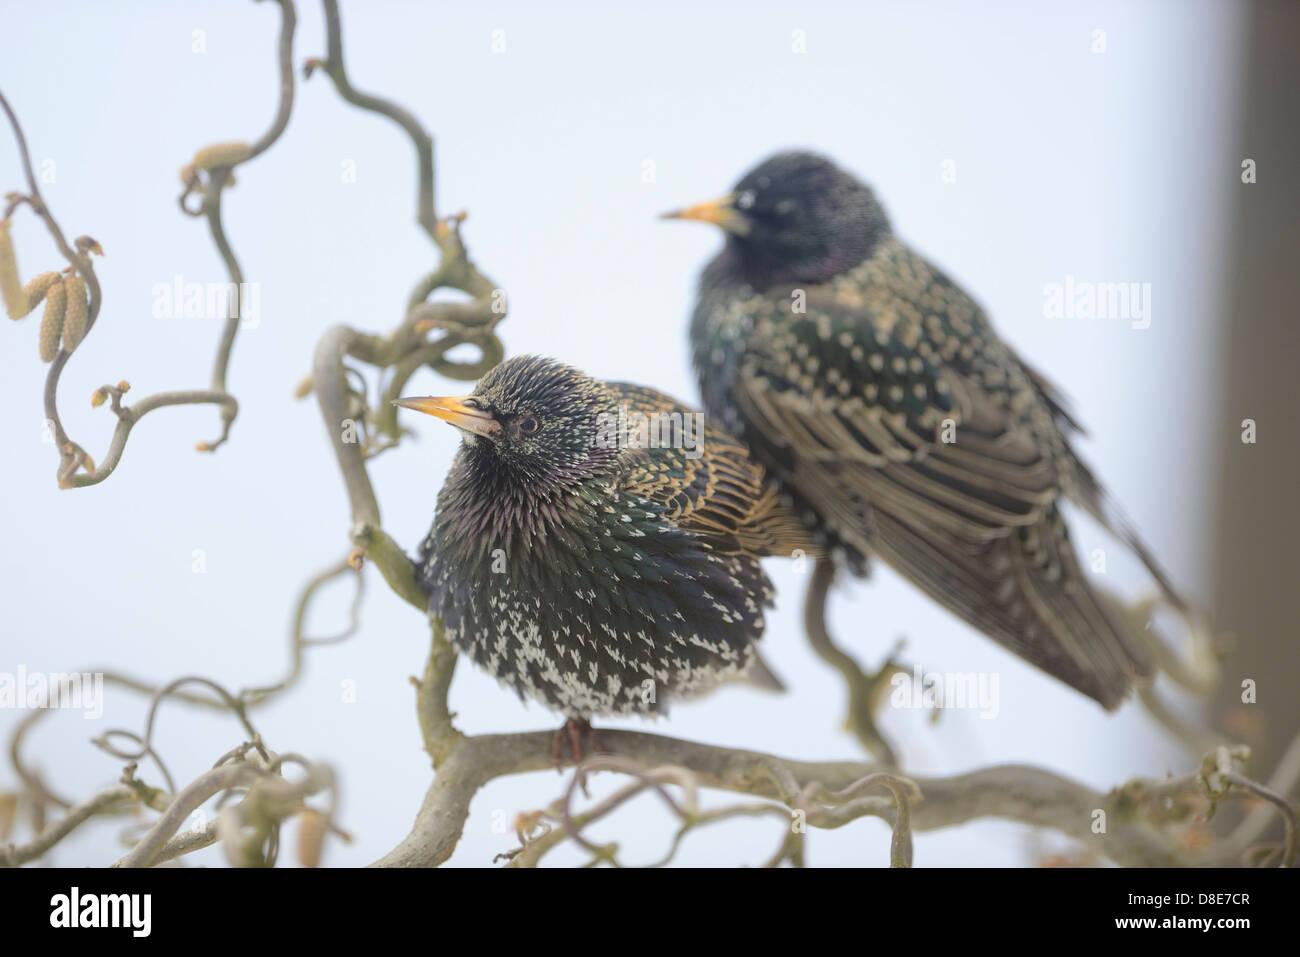 Two Common Starlings (Sturnus vulgaris) sitting on a branch - Stock Image